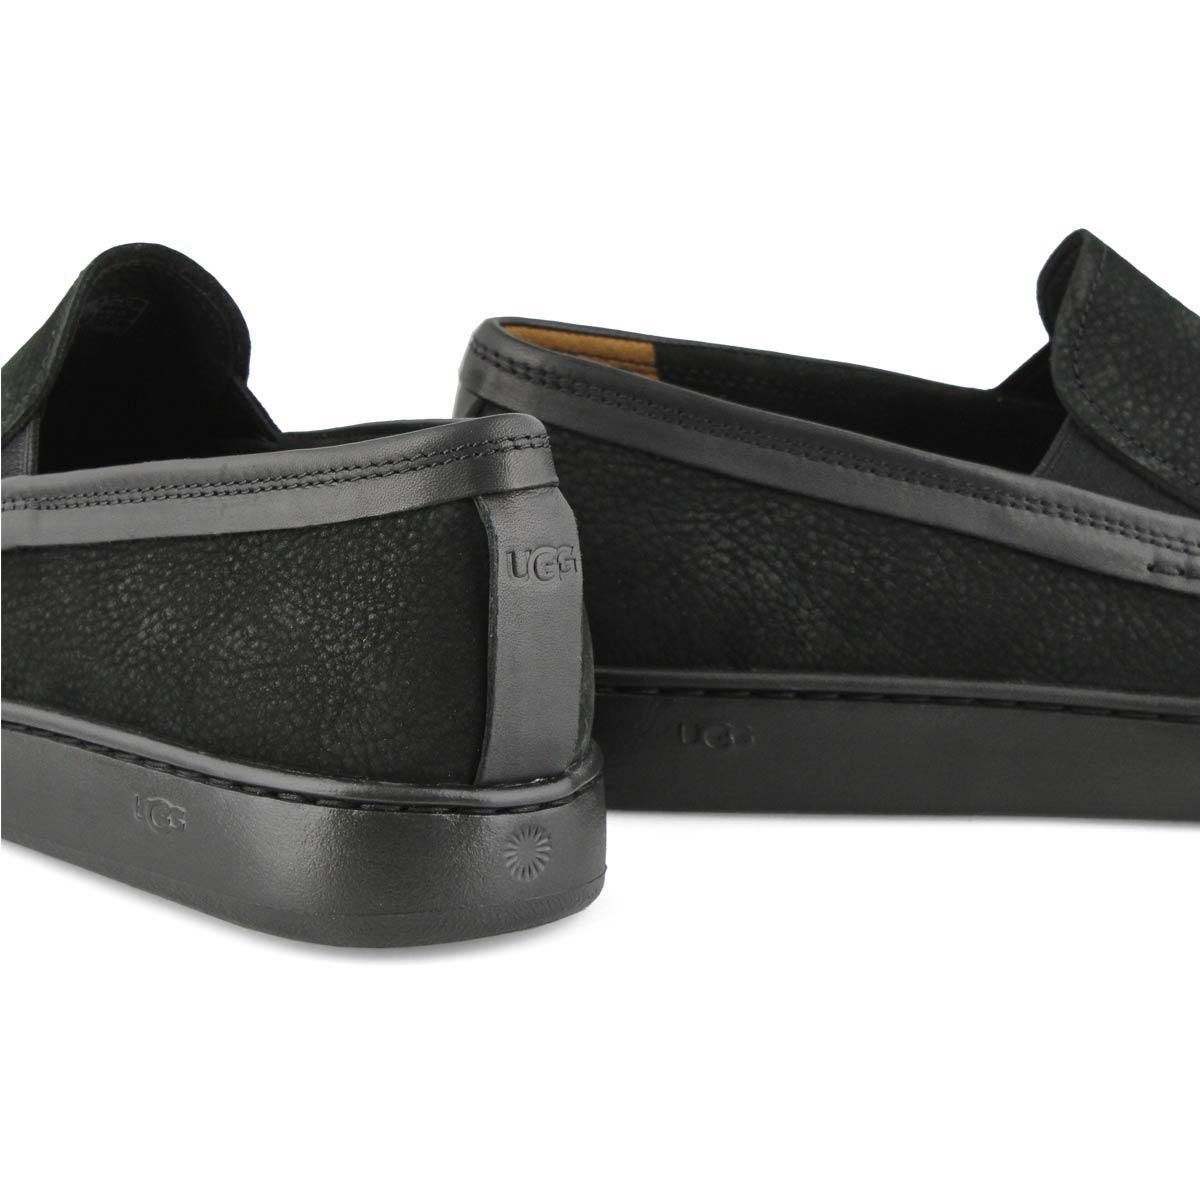 Men's Pismo Slip On Sneaker - Black